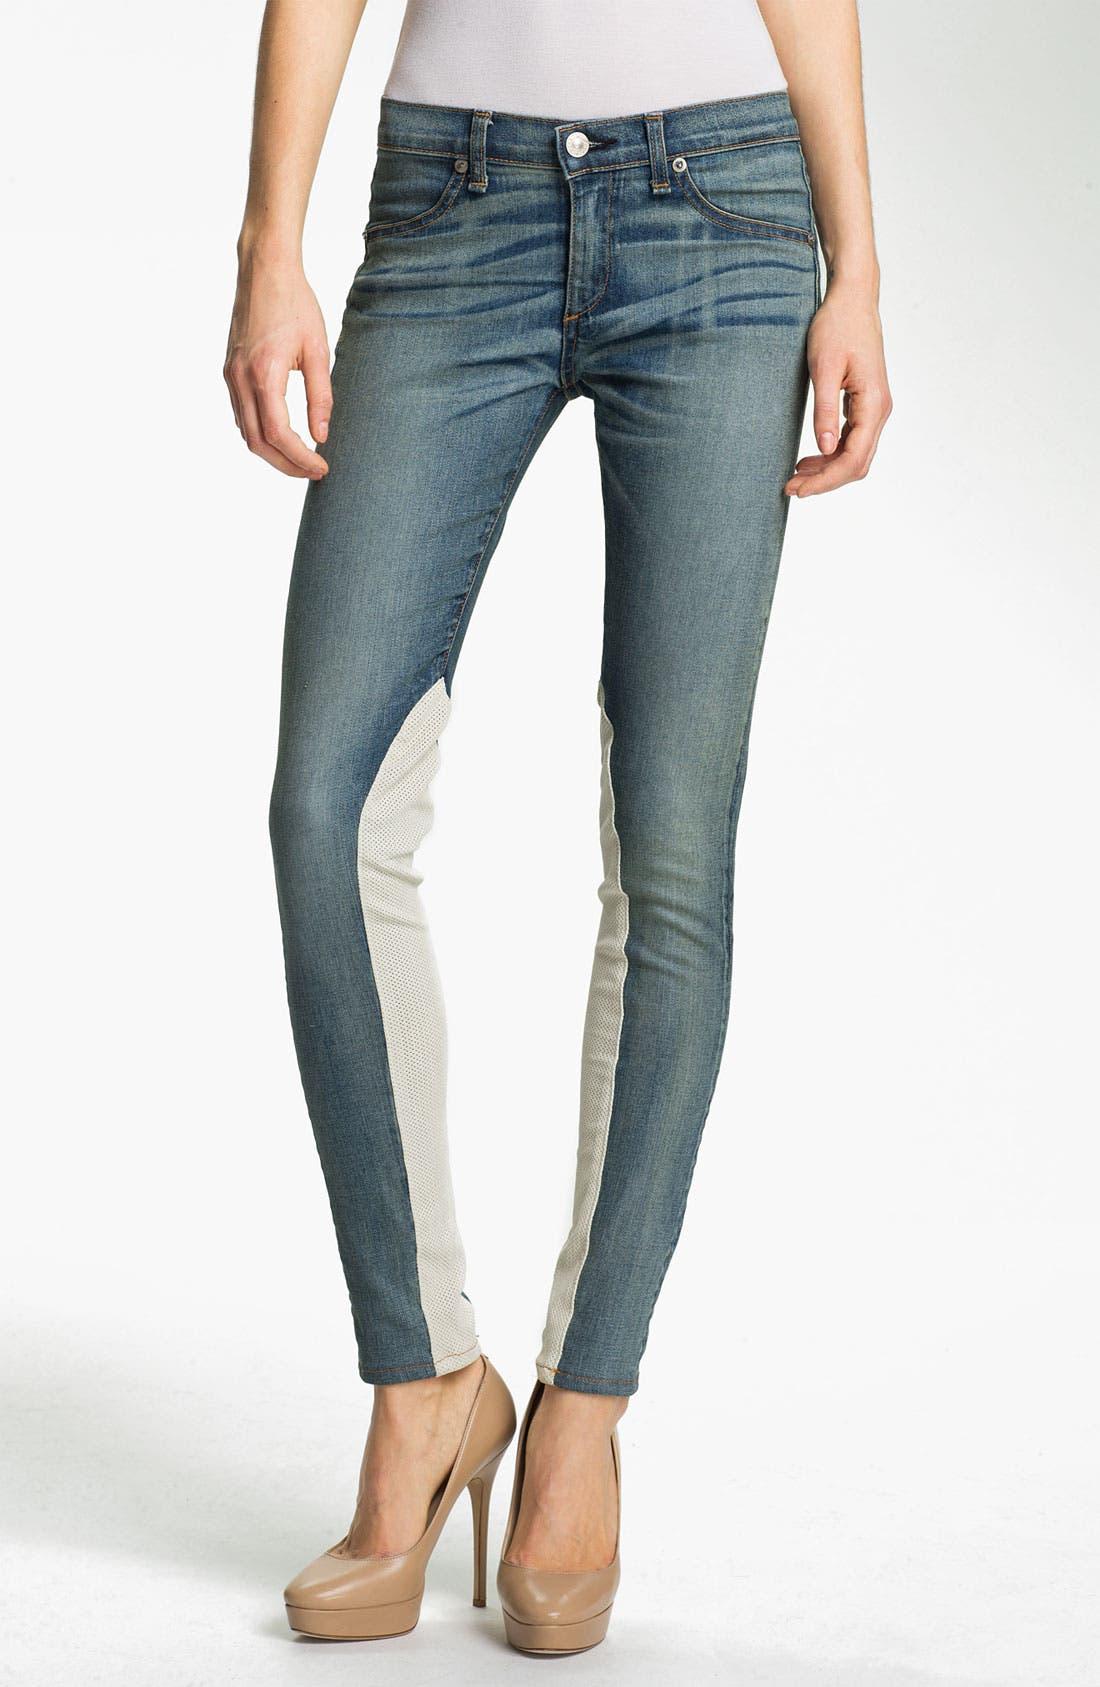 Alternate Image 1 Selected - rag & bone/JEAN Slim Leather & Denim Jeans